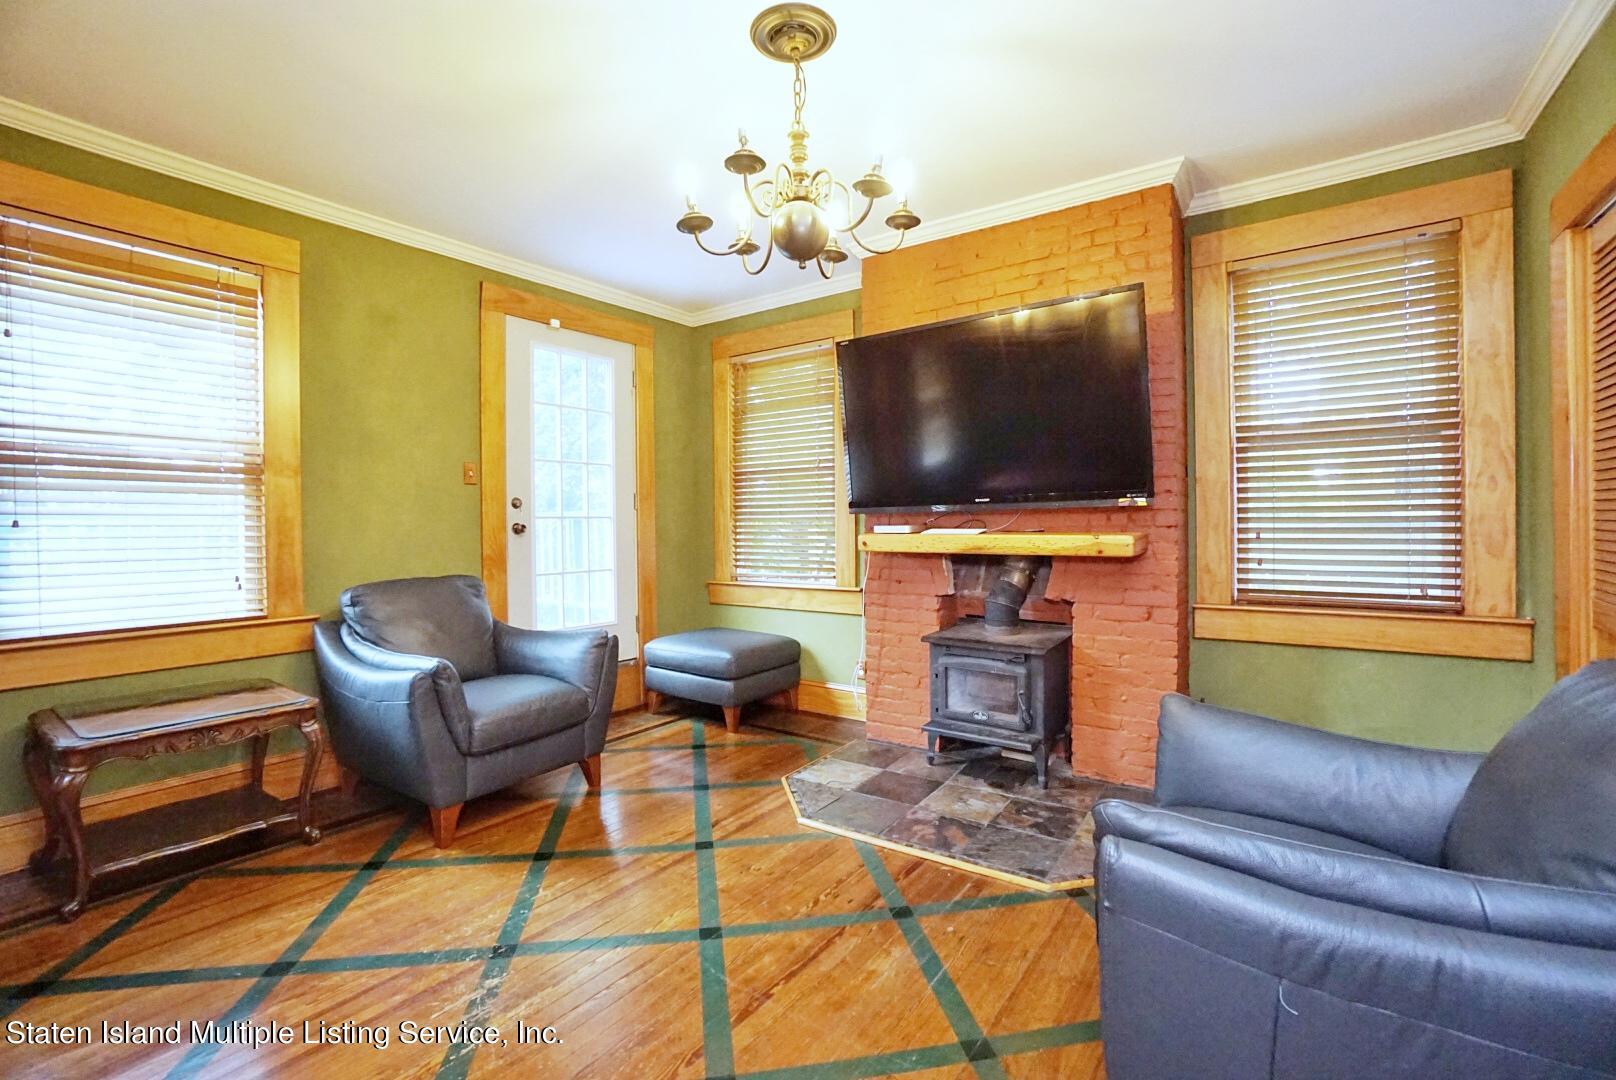 Single Family - Detached 136 York Avenue  Staten Island, NY 10301, MLS-1147575-27